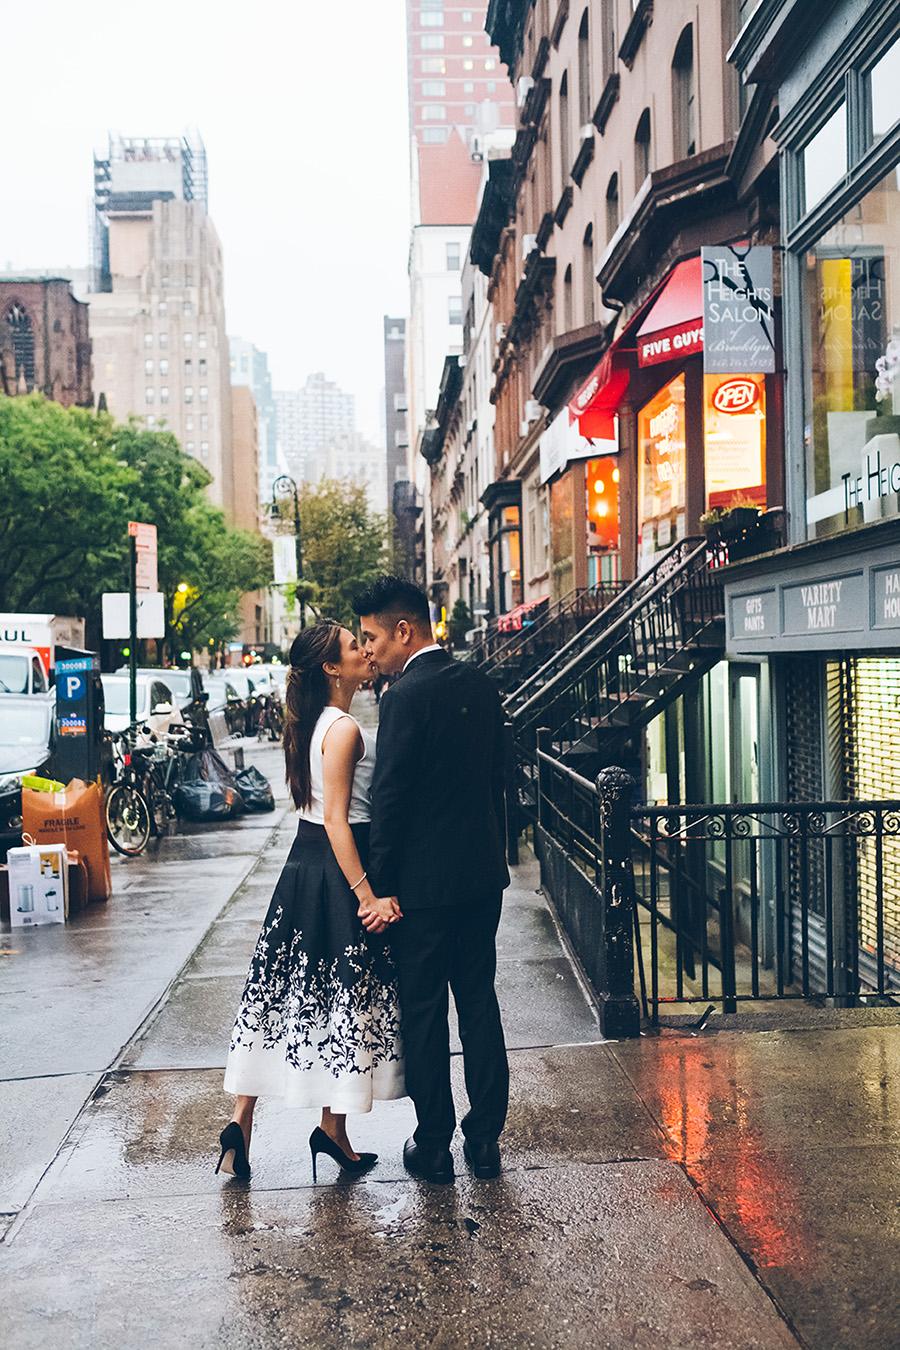 NEW-YORK-CITY-WEDDING-PHOTOGRAPHER-INTIMATE-WEDDING-ELOPEMENT-BROOKLYN-PROMENADE-CITYHALL-MANHATTAN-BROOKLYN-WEDDING-PHOTOGRAPHY-JackieAaron-0055.jpg